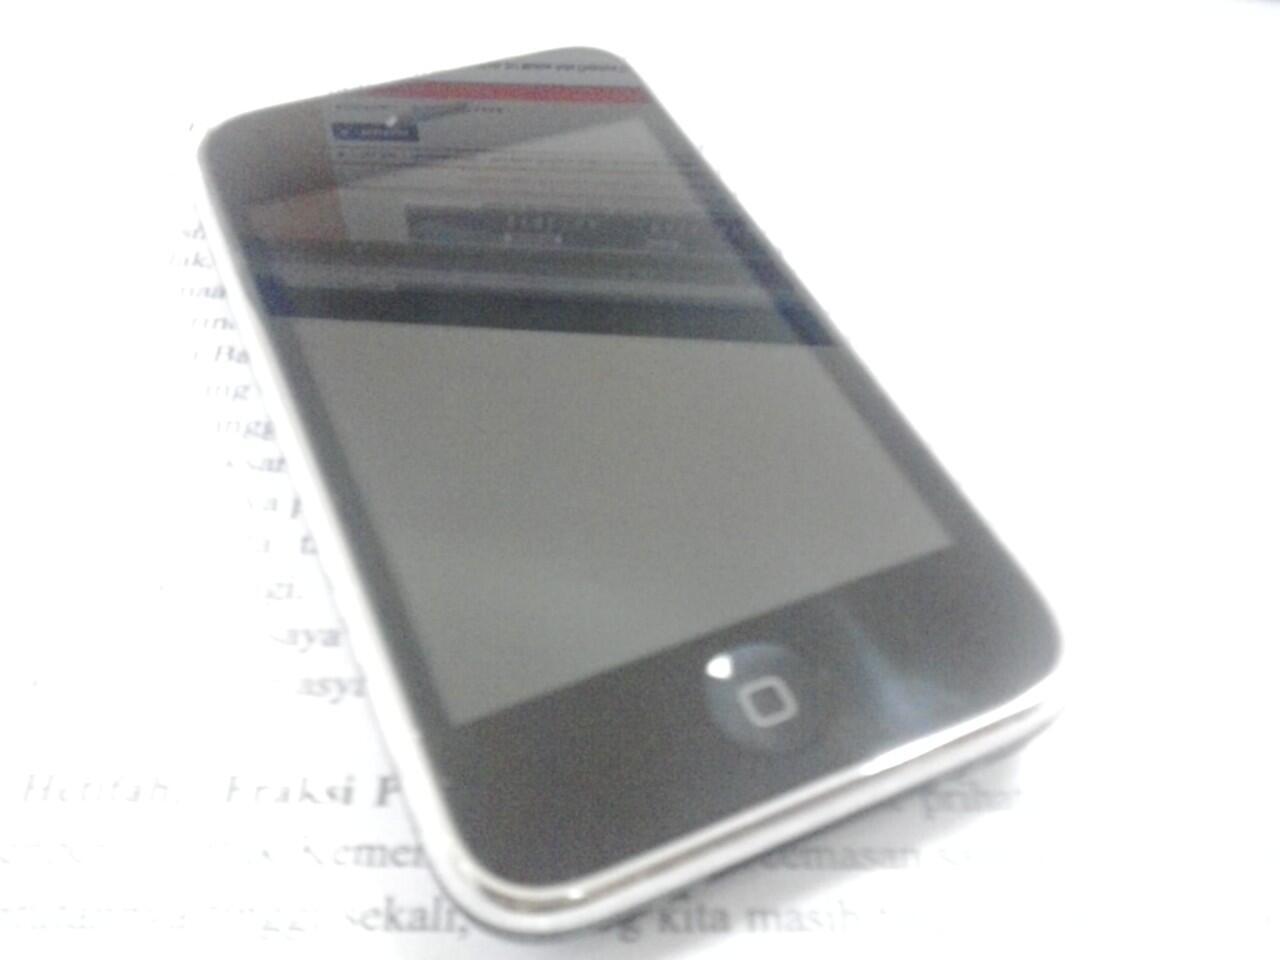 Iphone 3G 16gb SU Mulus KOMPLIT Like New, Handcarry US